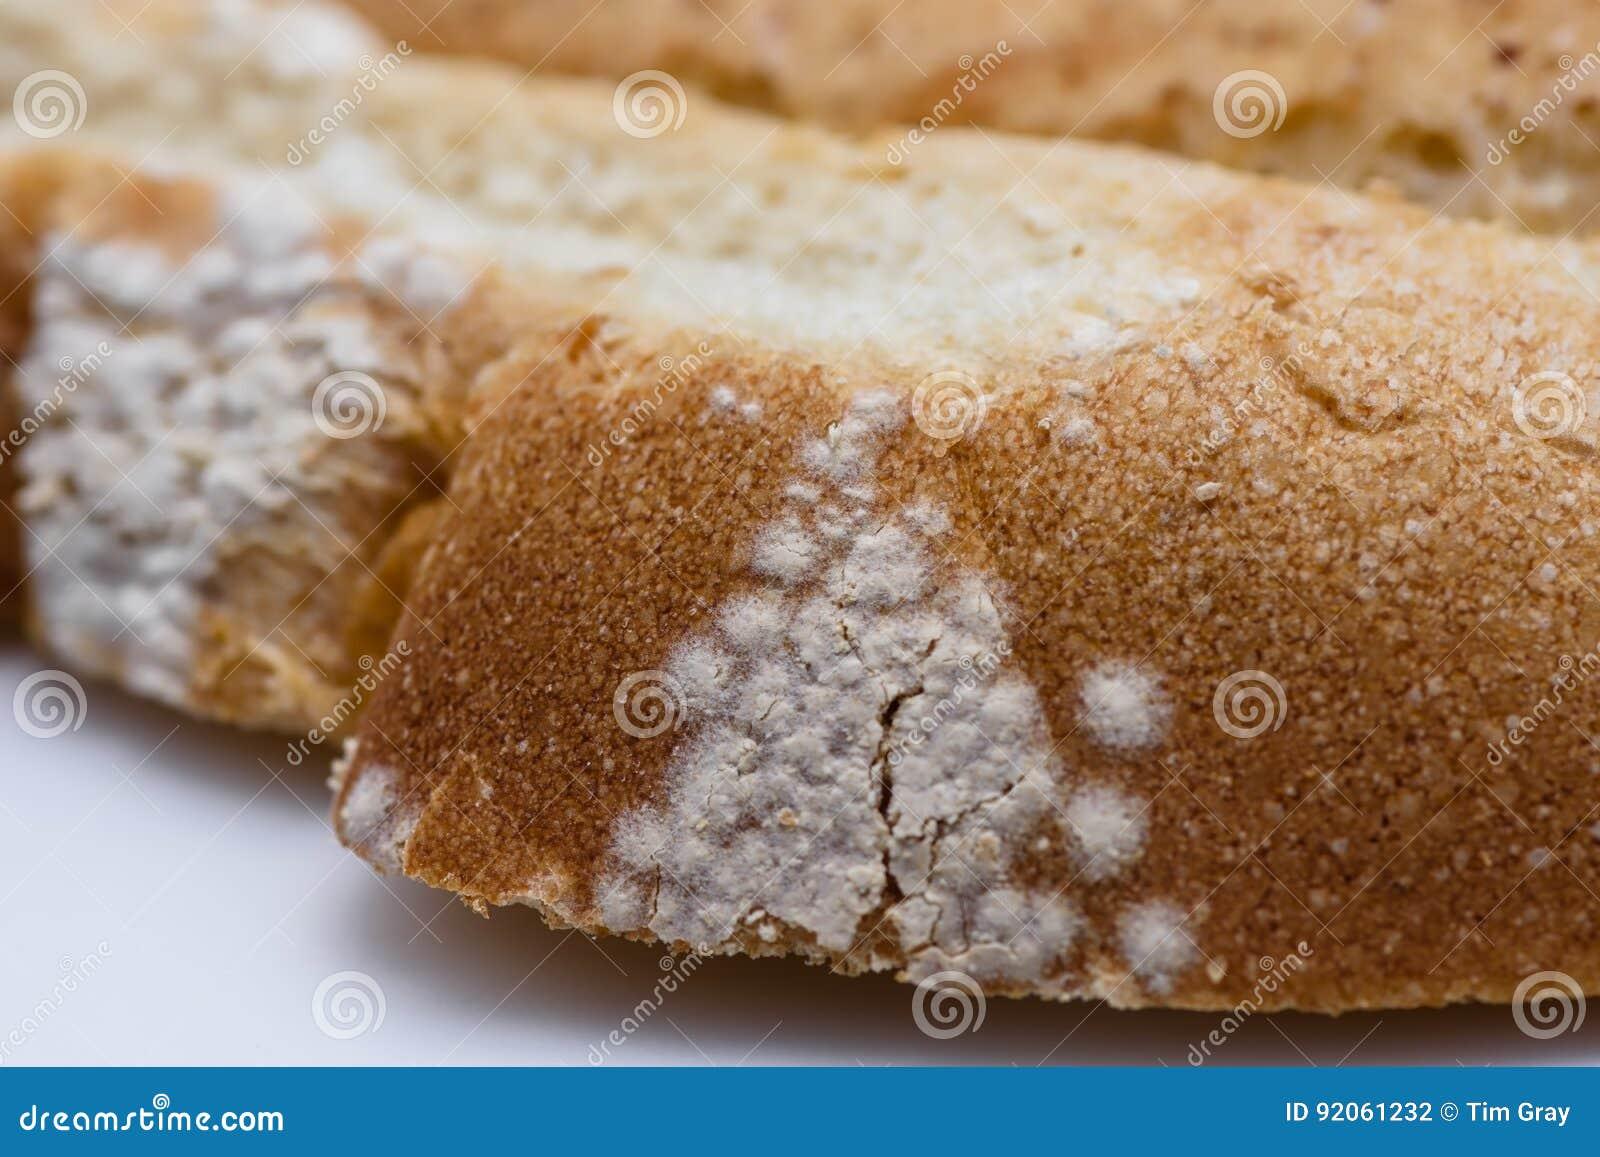 Slice Of Bread Stacked With White Mold Macro Stock Photo Image Of Cake Macro 92061232